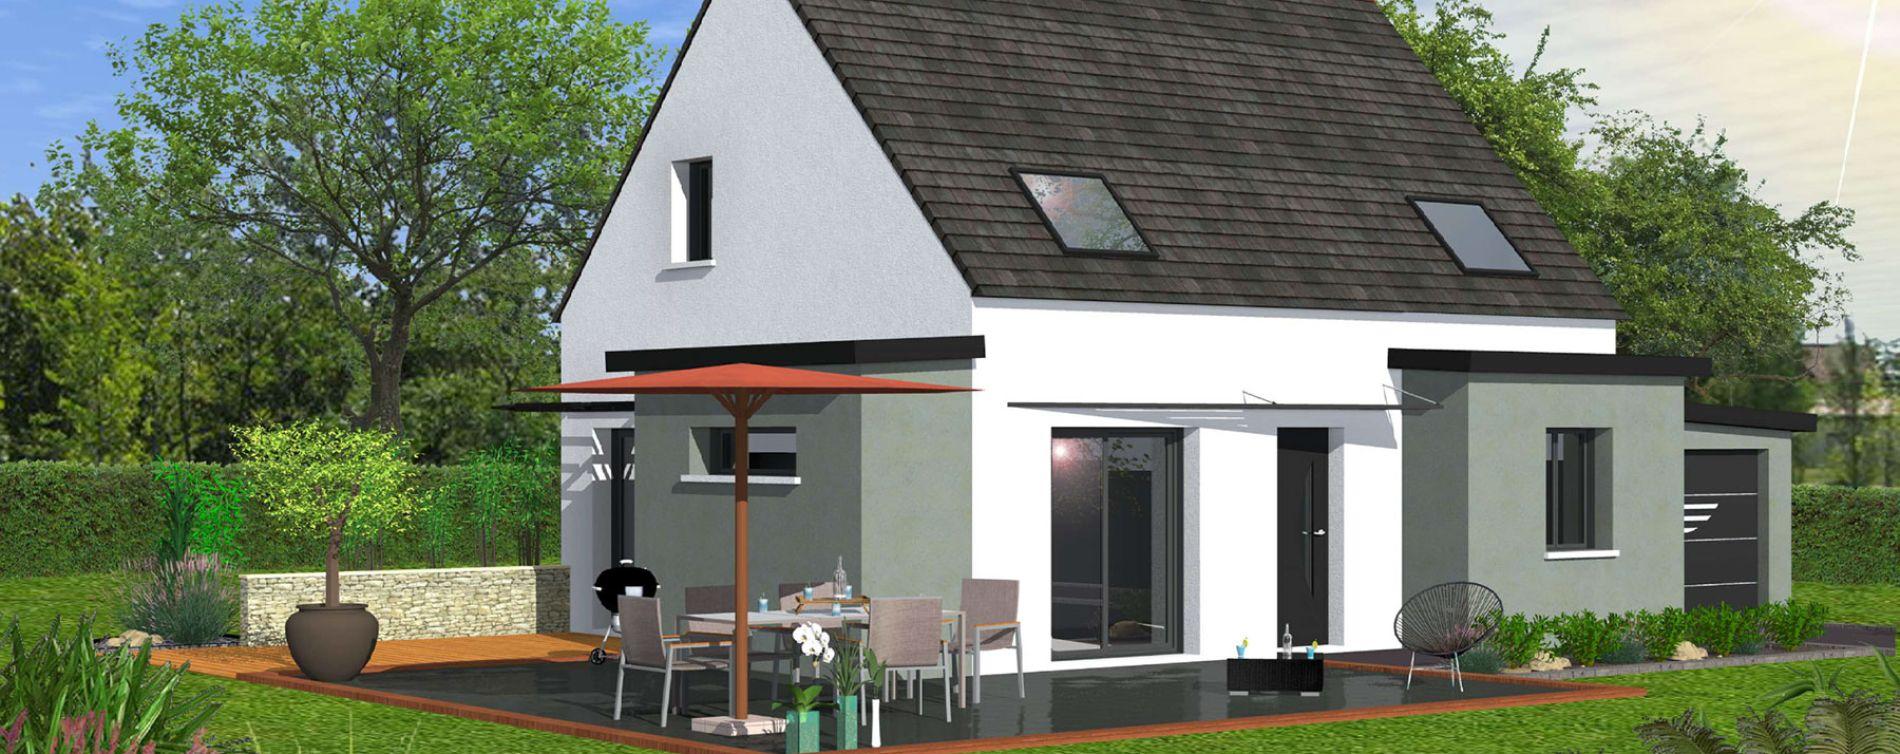 Lesneven : programme immobilier neuve « Pen Ar C'Hoat » (2)